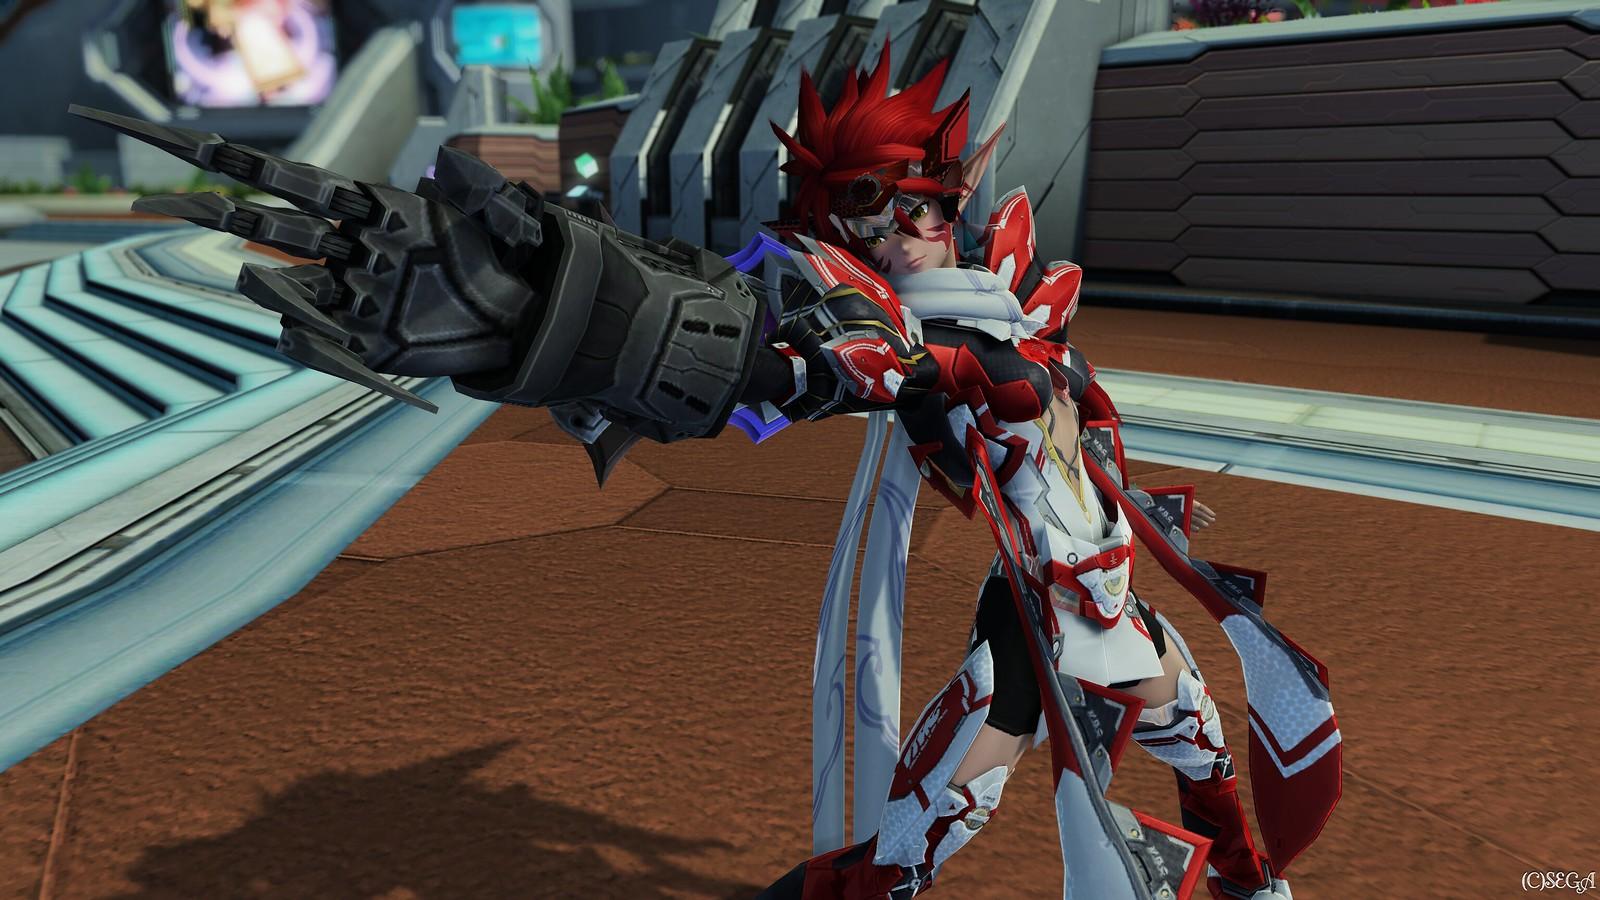 Phantasy Star Online 2 Screenshot 2020.11.24 - 23.04.39.49